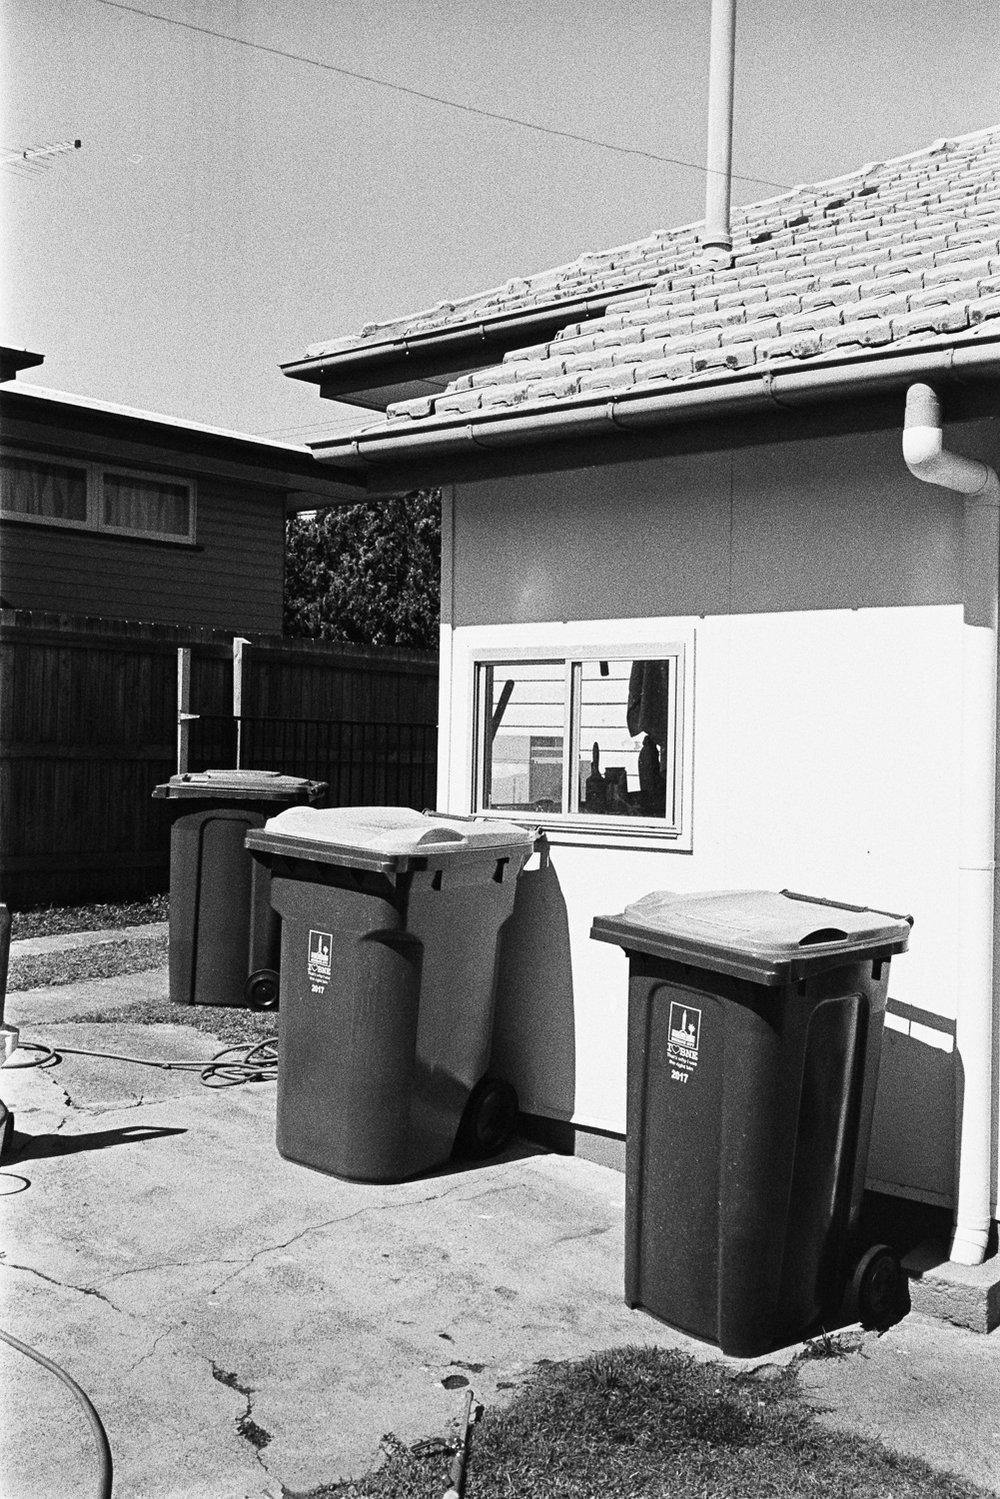 More goddamn bins